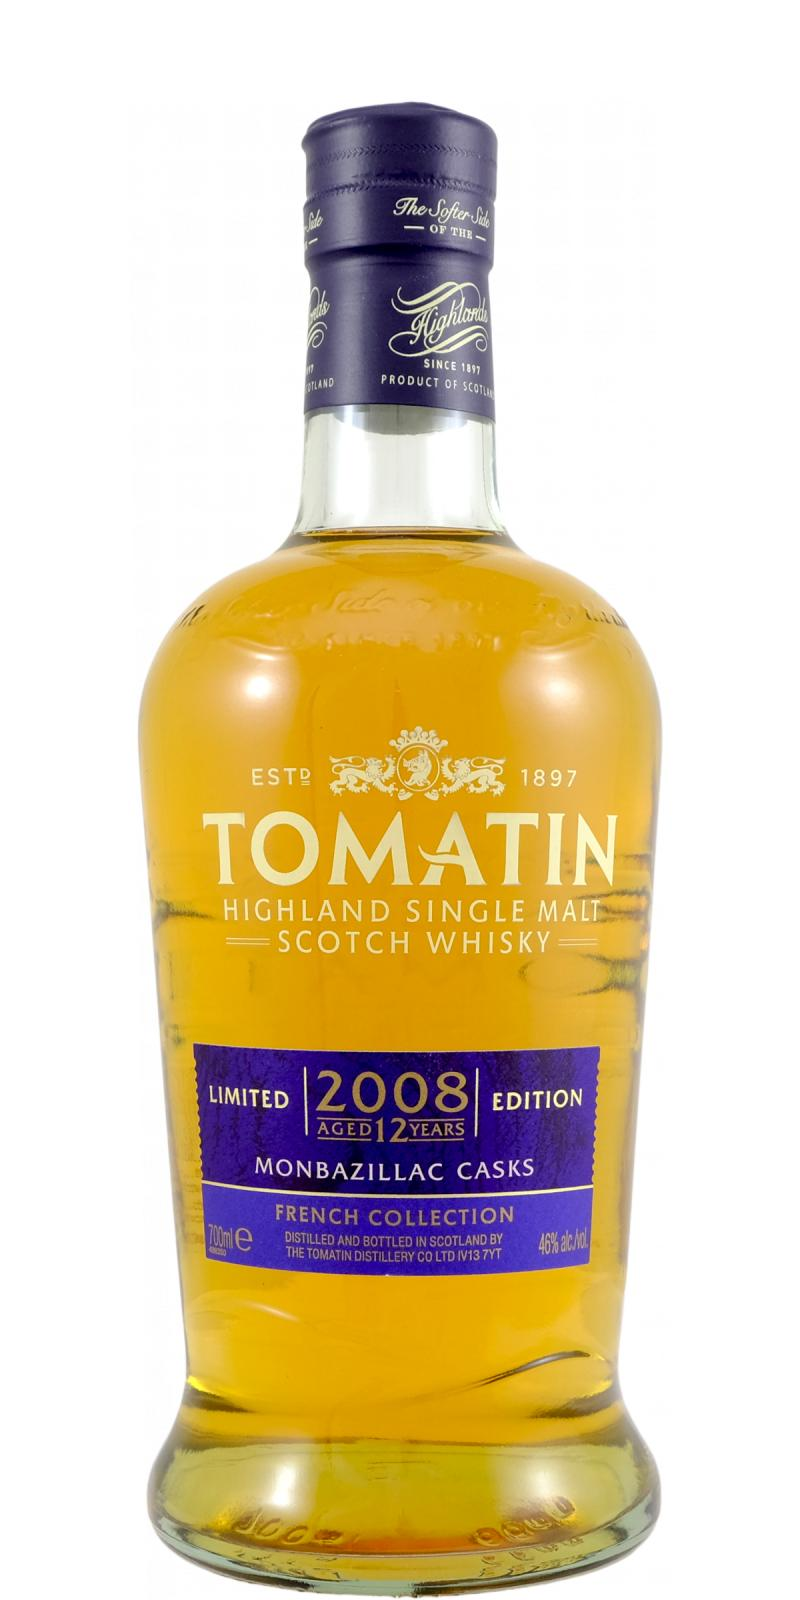 Tomatin 2008